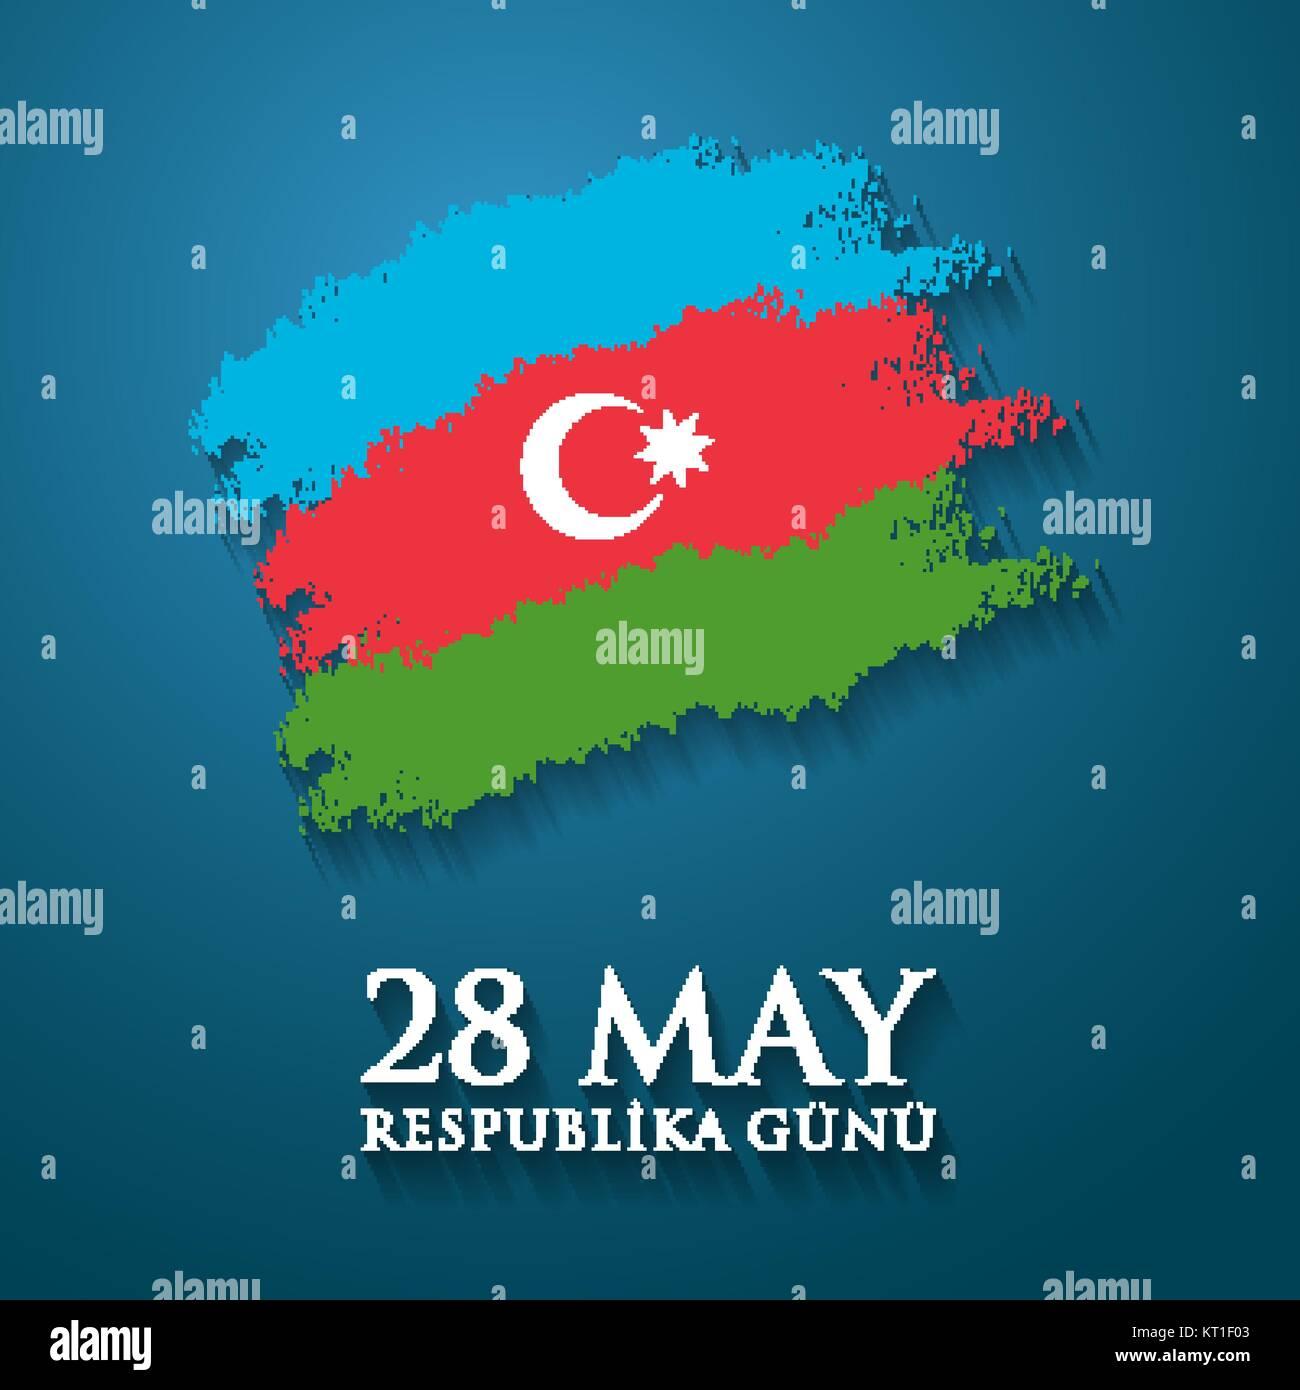 28 May Respublika gunu. Translation from azerbaijani: 28th May Republic day of Azerbaijan. - Stock Vector